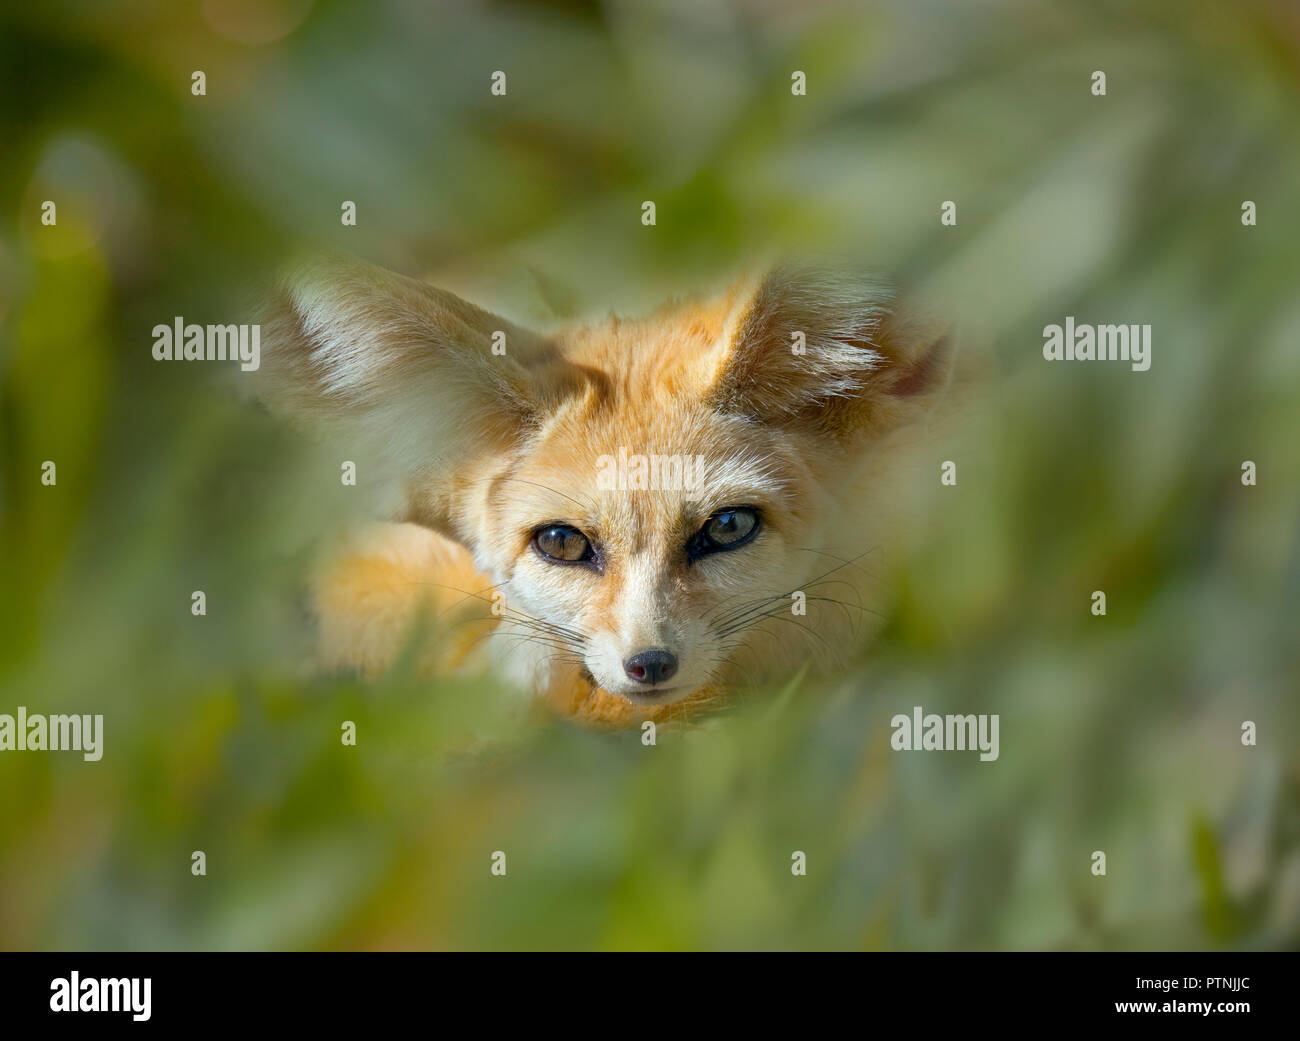 Fennec Fox Vulpes zerda dormir photographie en captivité Photo Stock